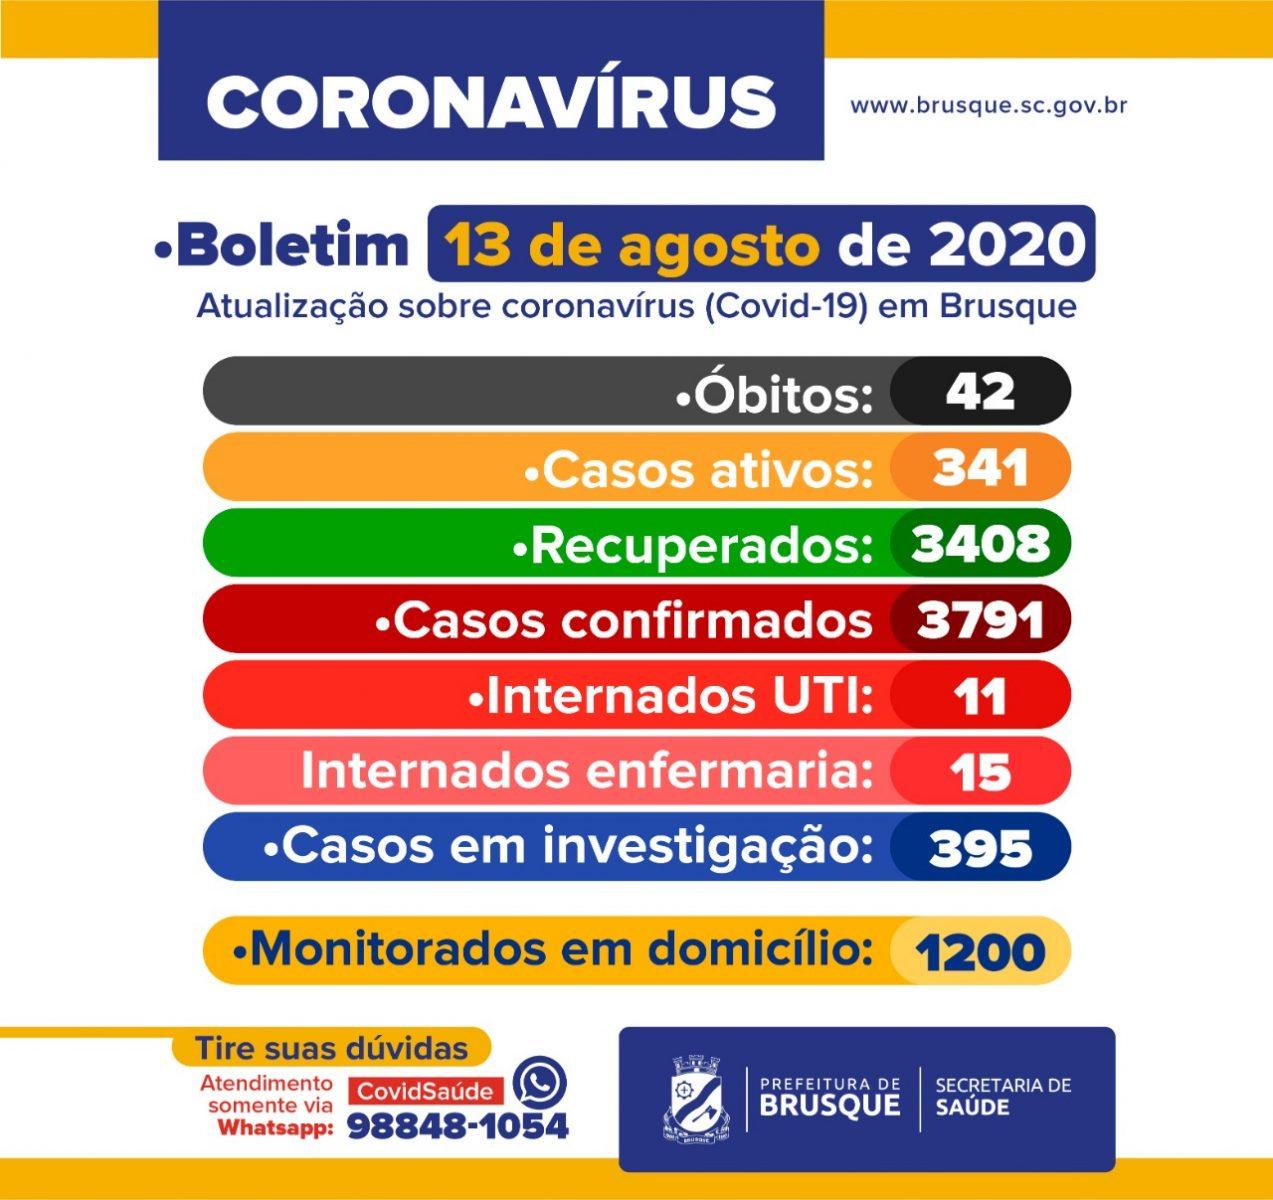 Confira o Boletim Epidemiológico da Prefeitura de Brusque desta quinta-feira (13)